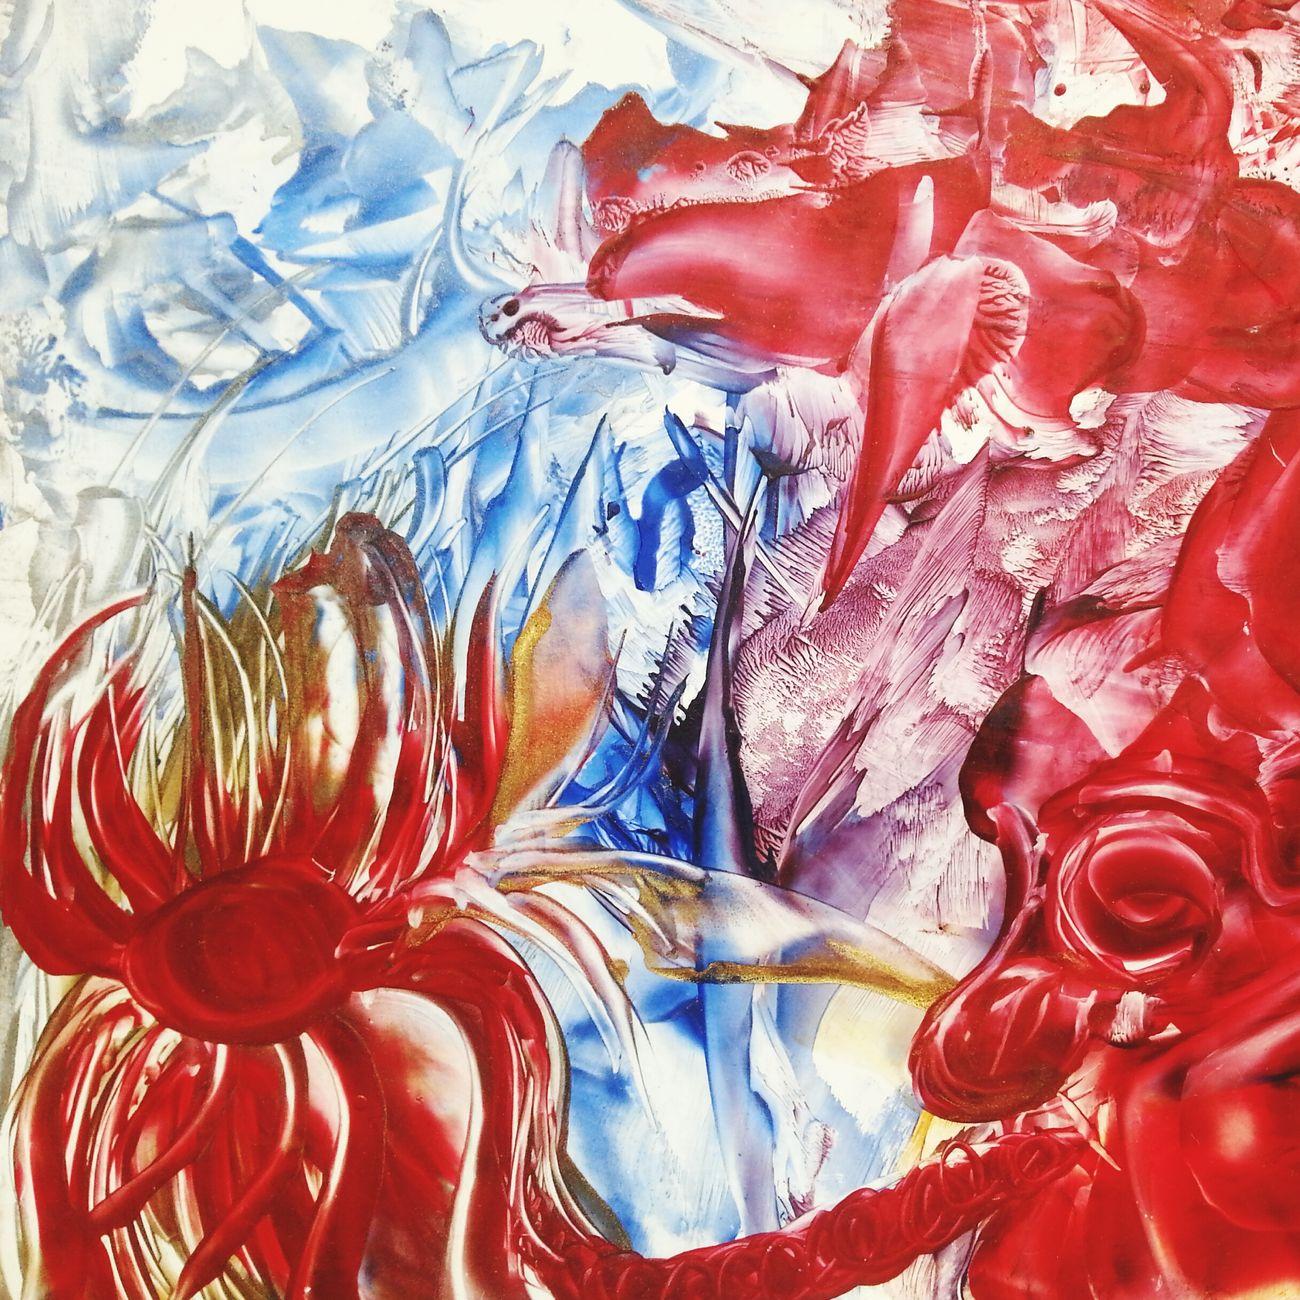 Eye Third Eye Third Eye Chakra Art, Drawing, Creativity Art World Artworks Spirituality Spiritual Colorful Intuitiveart SoulArt Art Gallery My Artistic Style Encaustic My Art, My Soul... Painting Creativity ArtWork See What I See See The Light Paint Warming The Soul Spiritualguidence Soul Intuitive Art